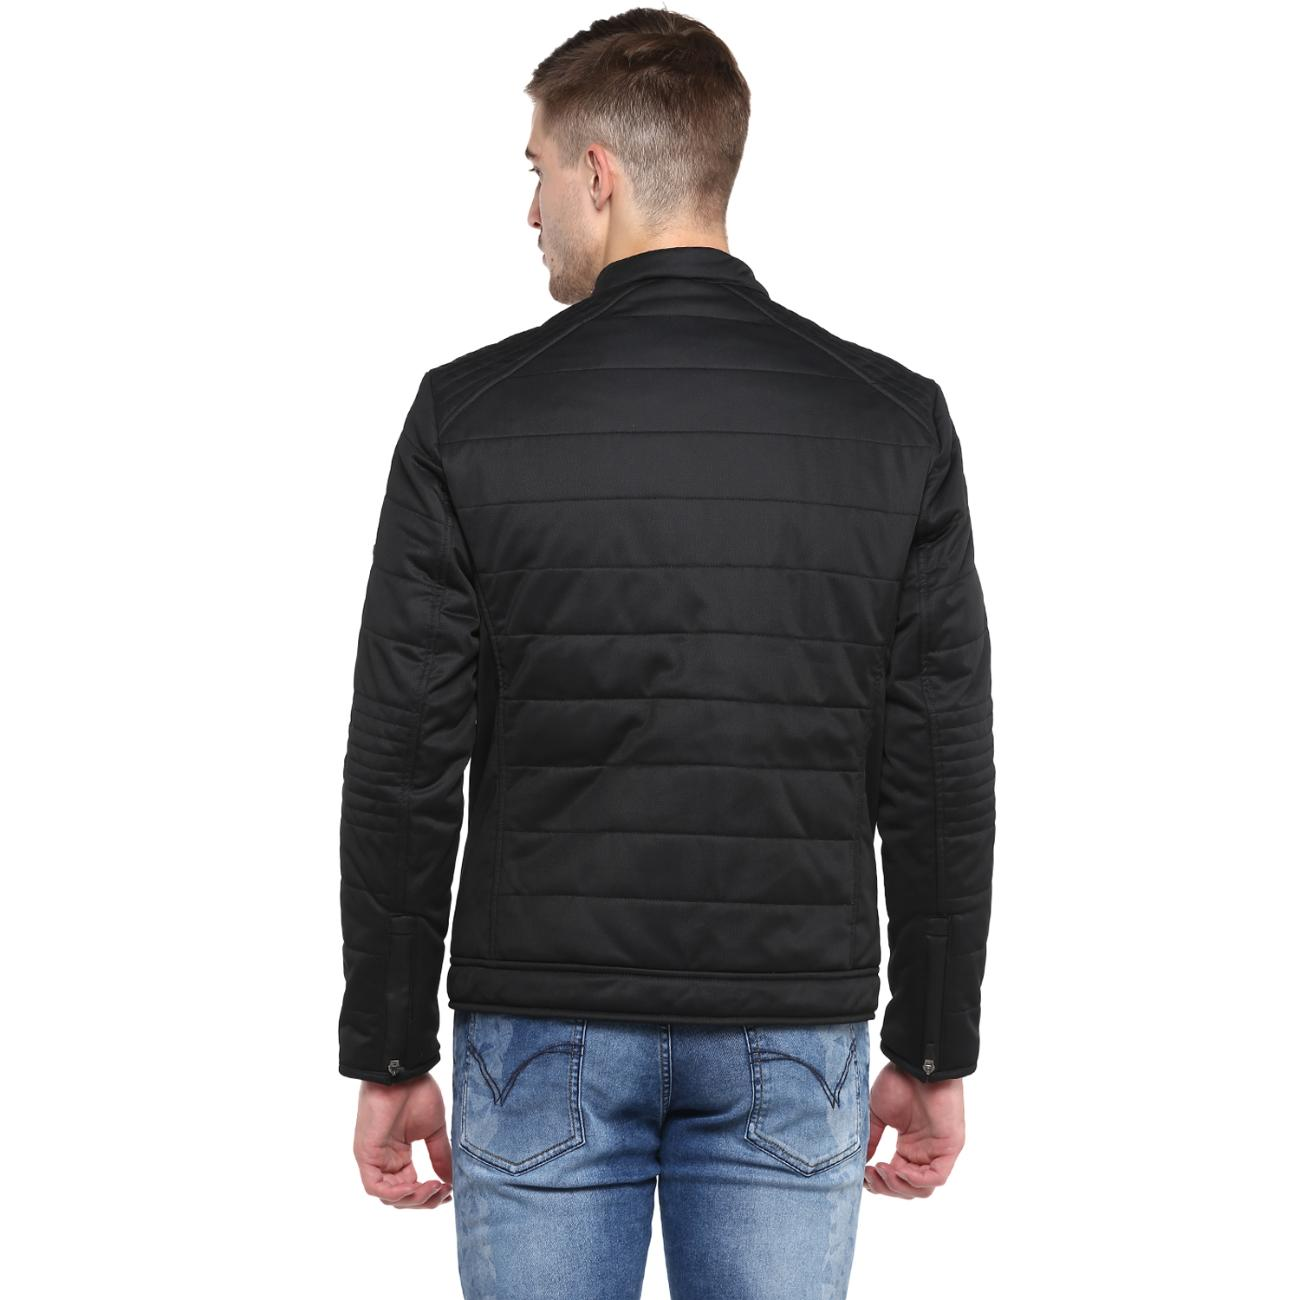 Black Quilted Biker Jacket Online